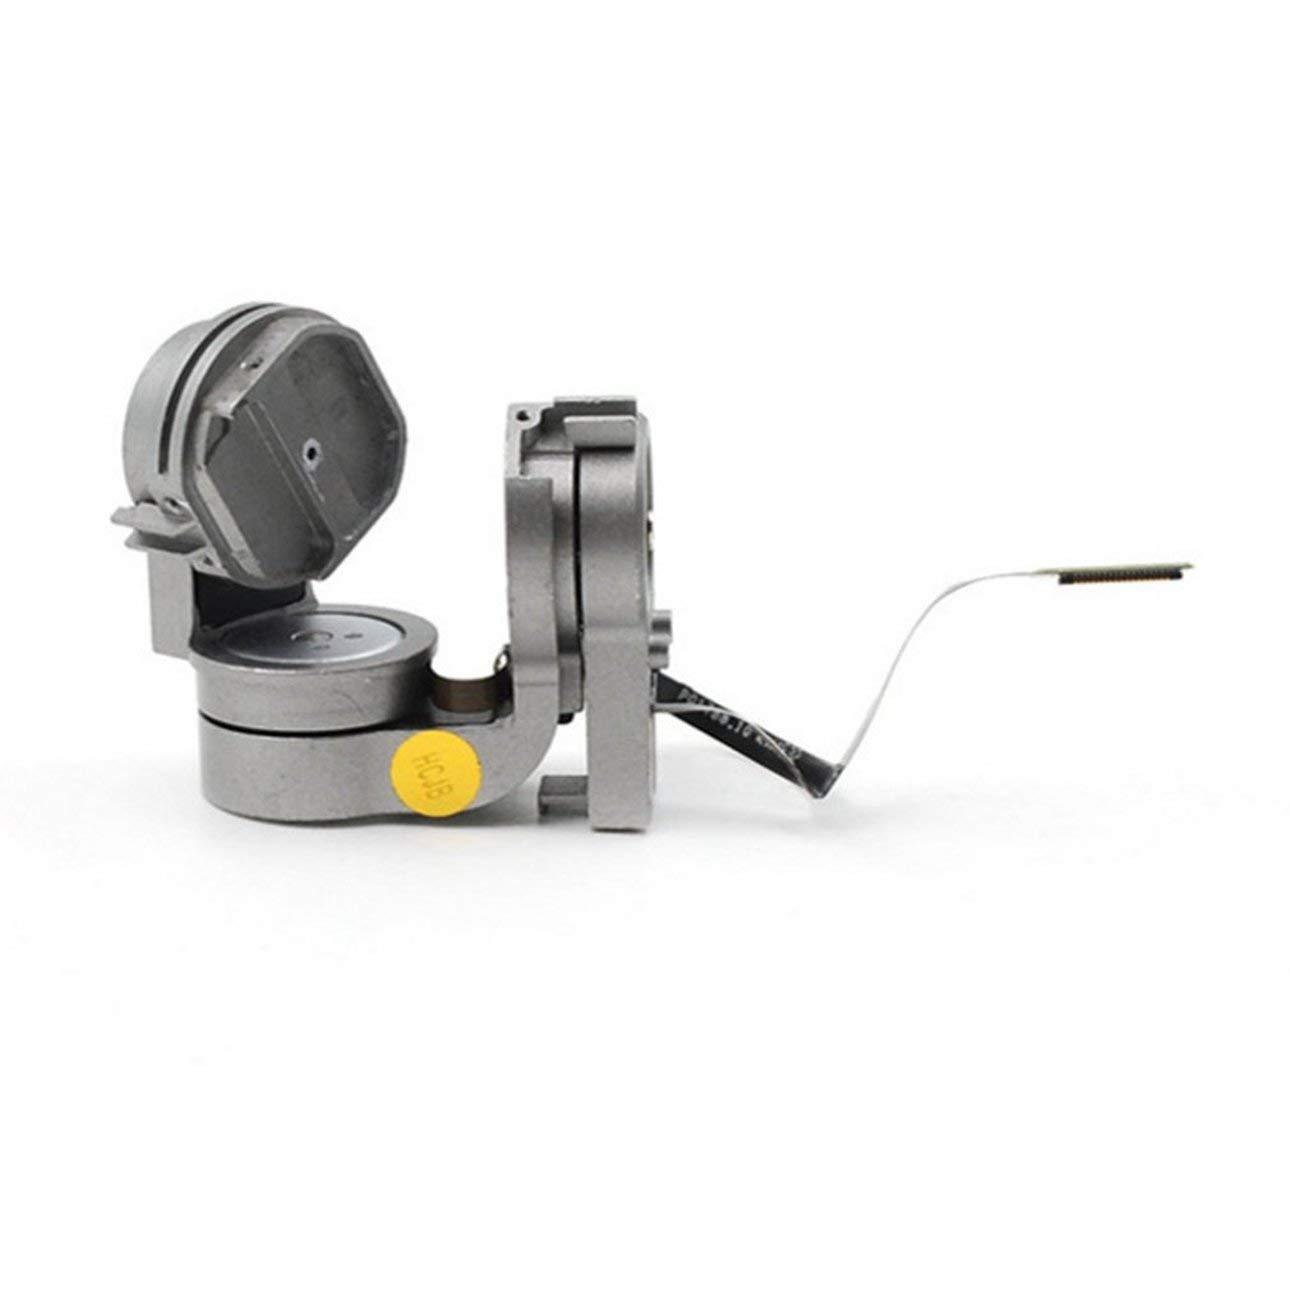 Ballylelly Drone Gimbal Kamera Arm mit Flat-Flexkabel-Reparatur-Teile für DJI Mavic Pro